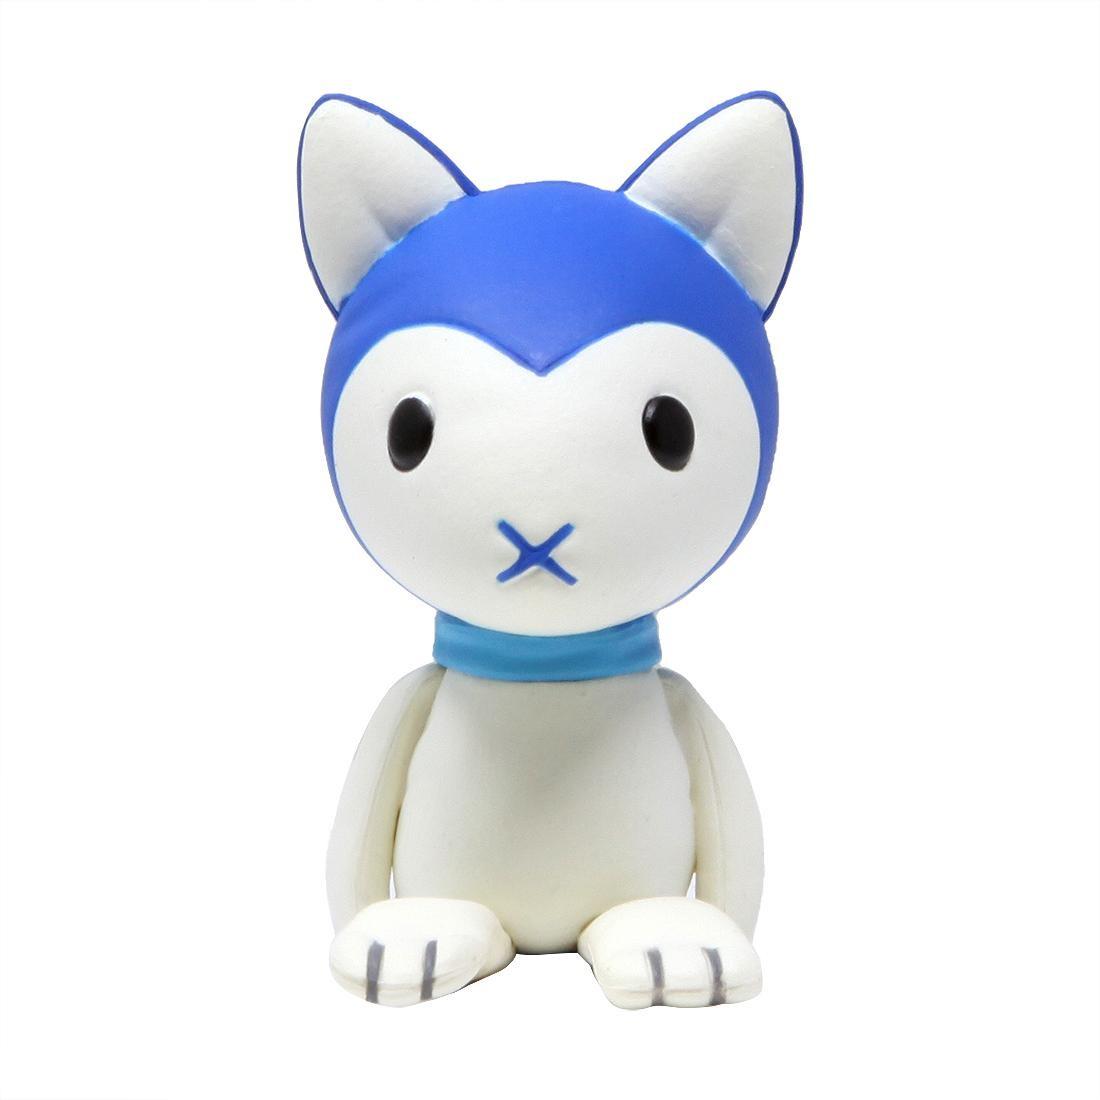 Medicom UDF Studio Chizu Series 2 Wolf Children Ame Plush Figure (blue)